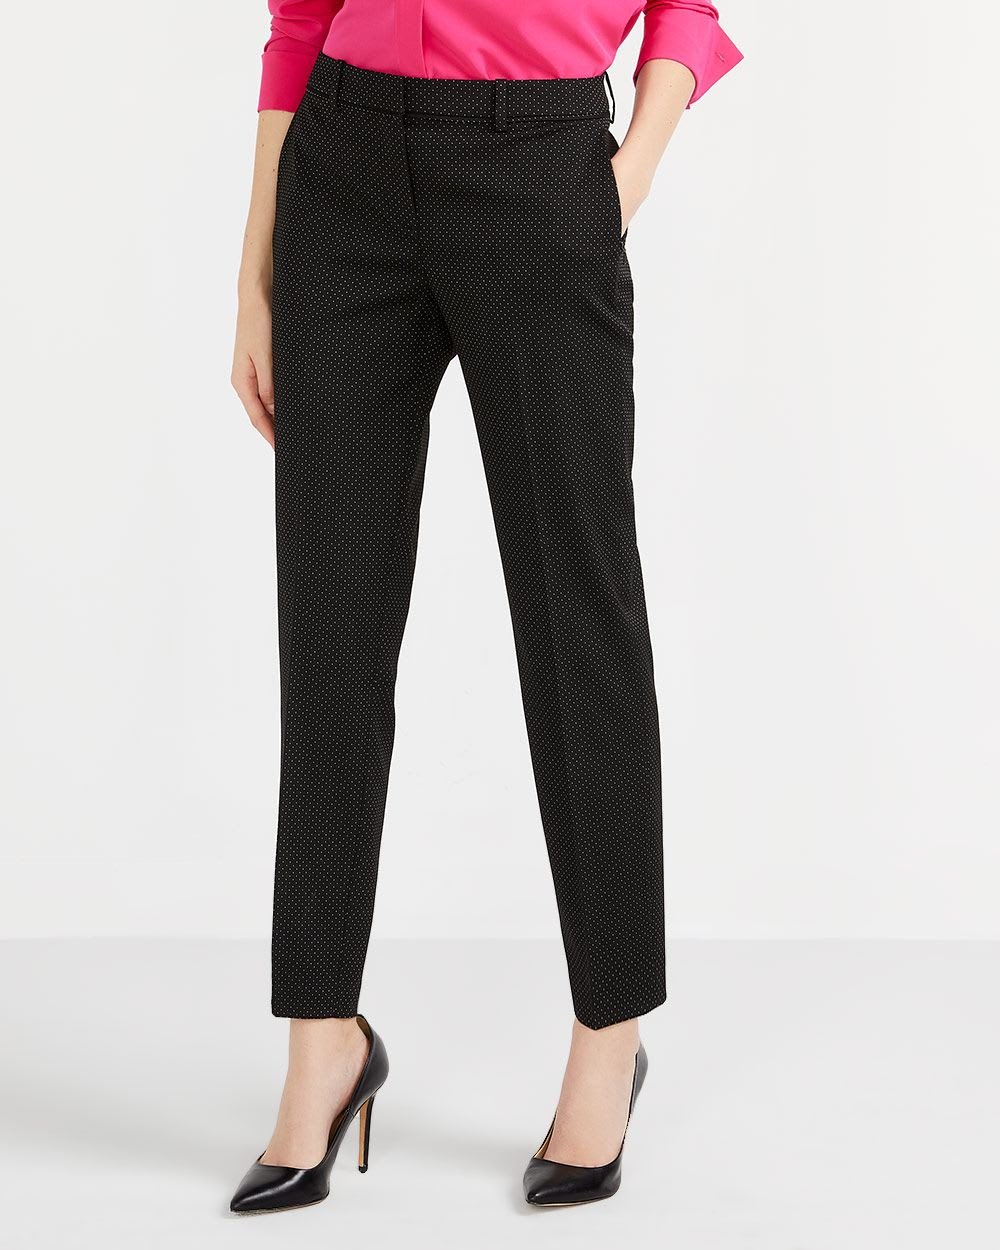 Willow & Thread Polka Dot Tailored Pants